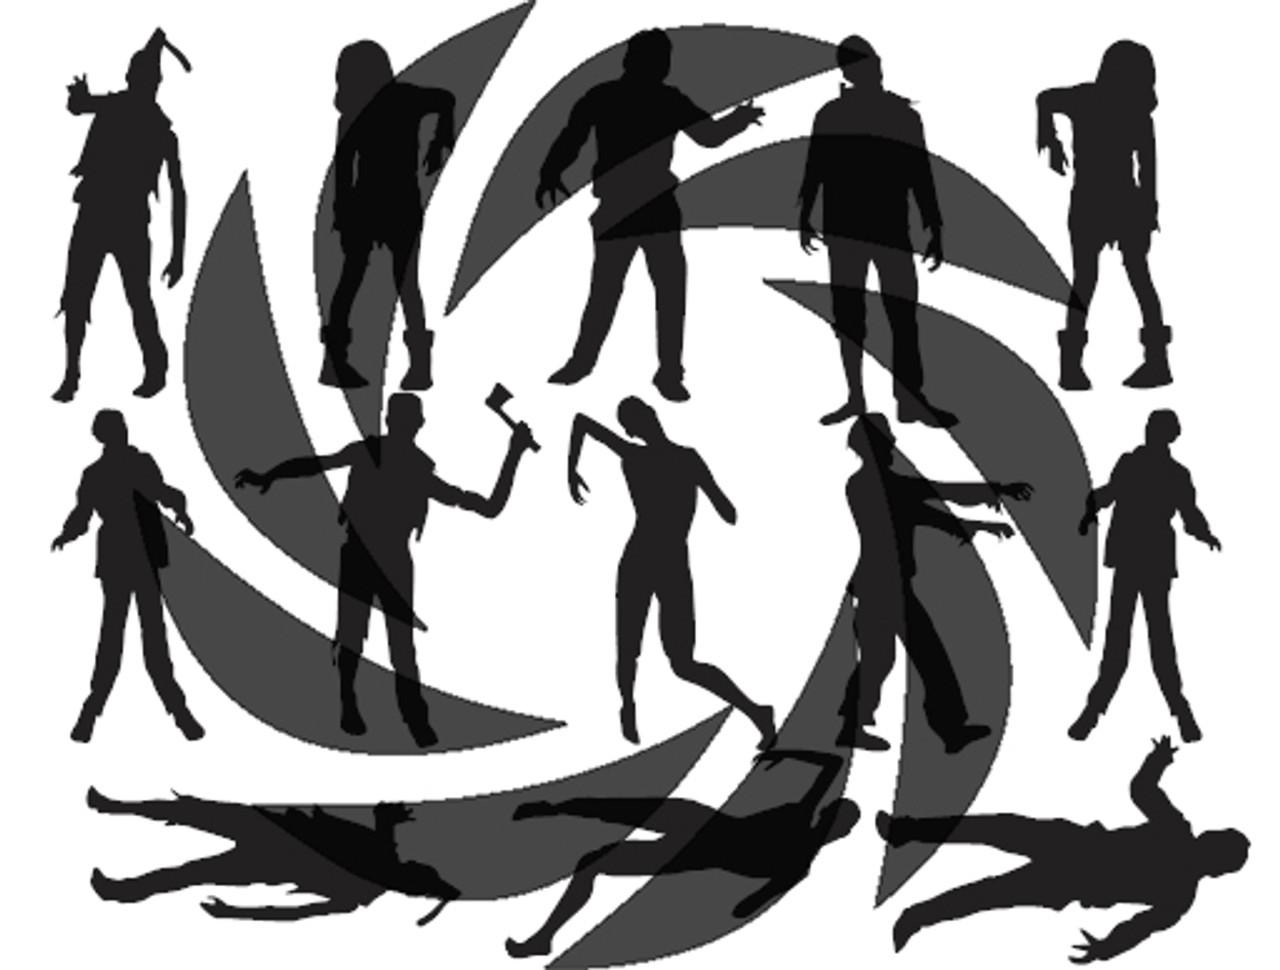 Zombie Stencils